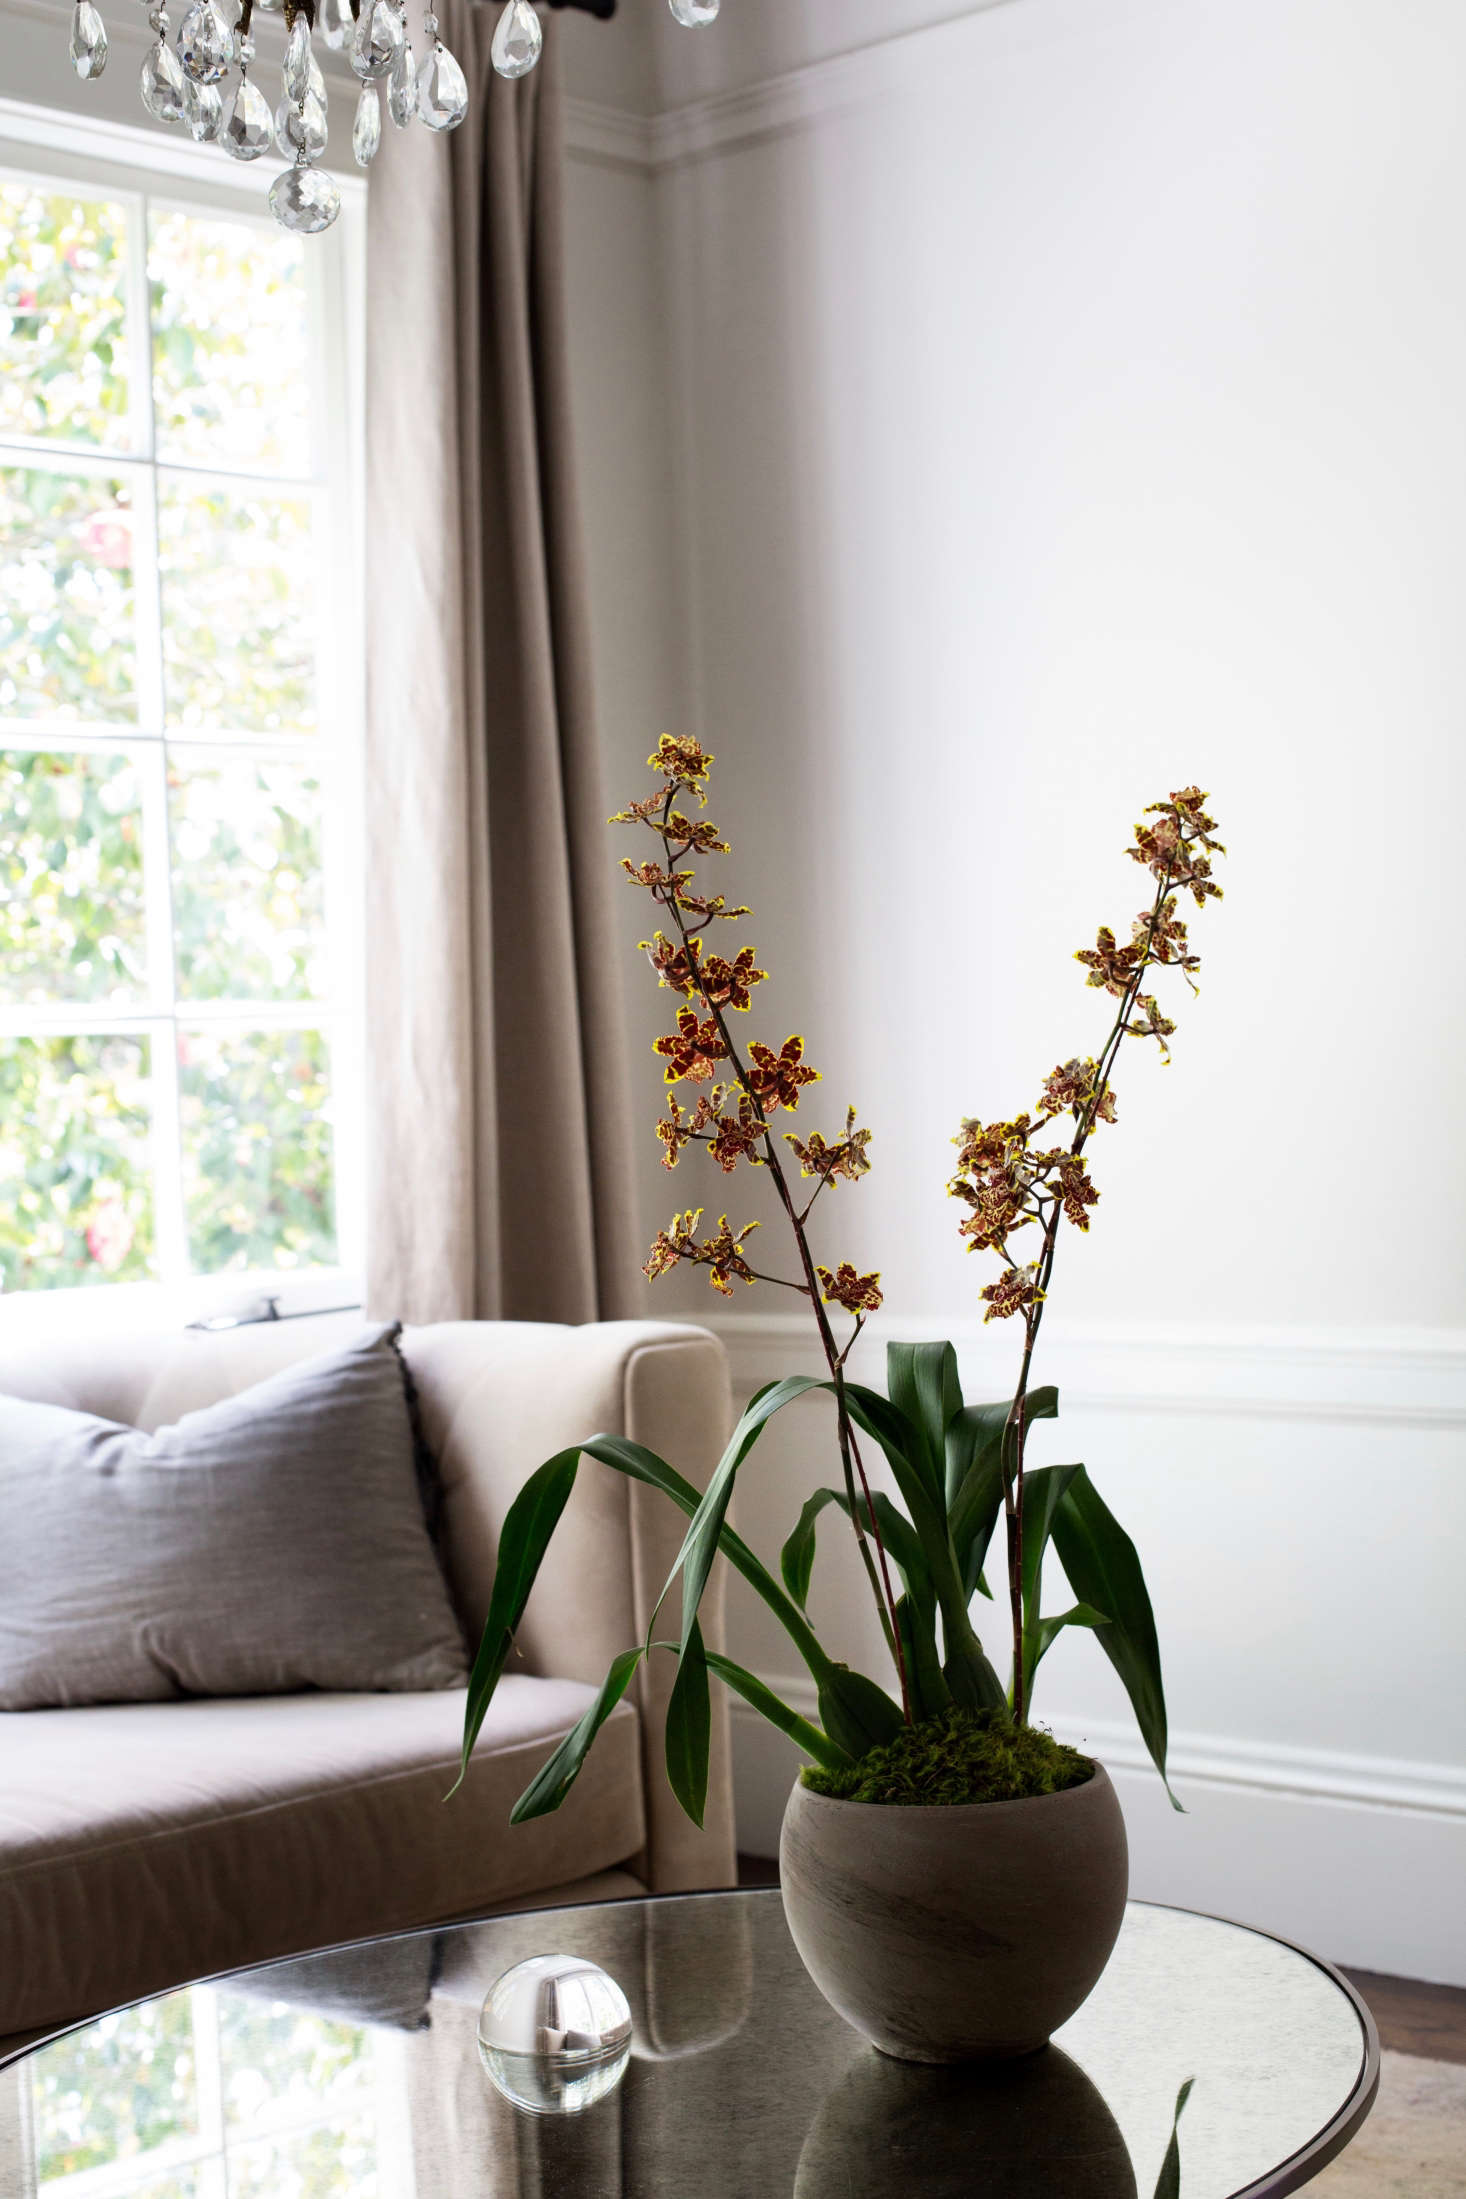 A lacy-flowered Oncidium orchid. Photograph by Mimi Giboin.